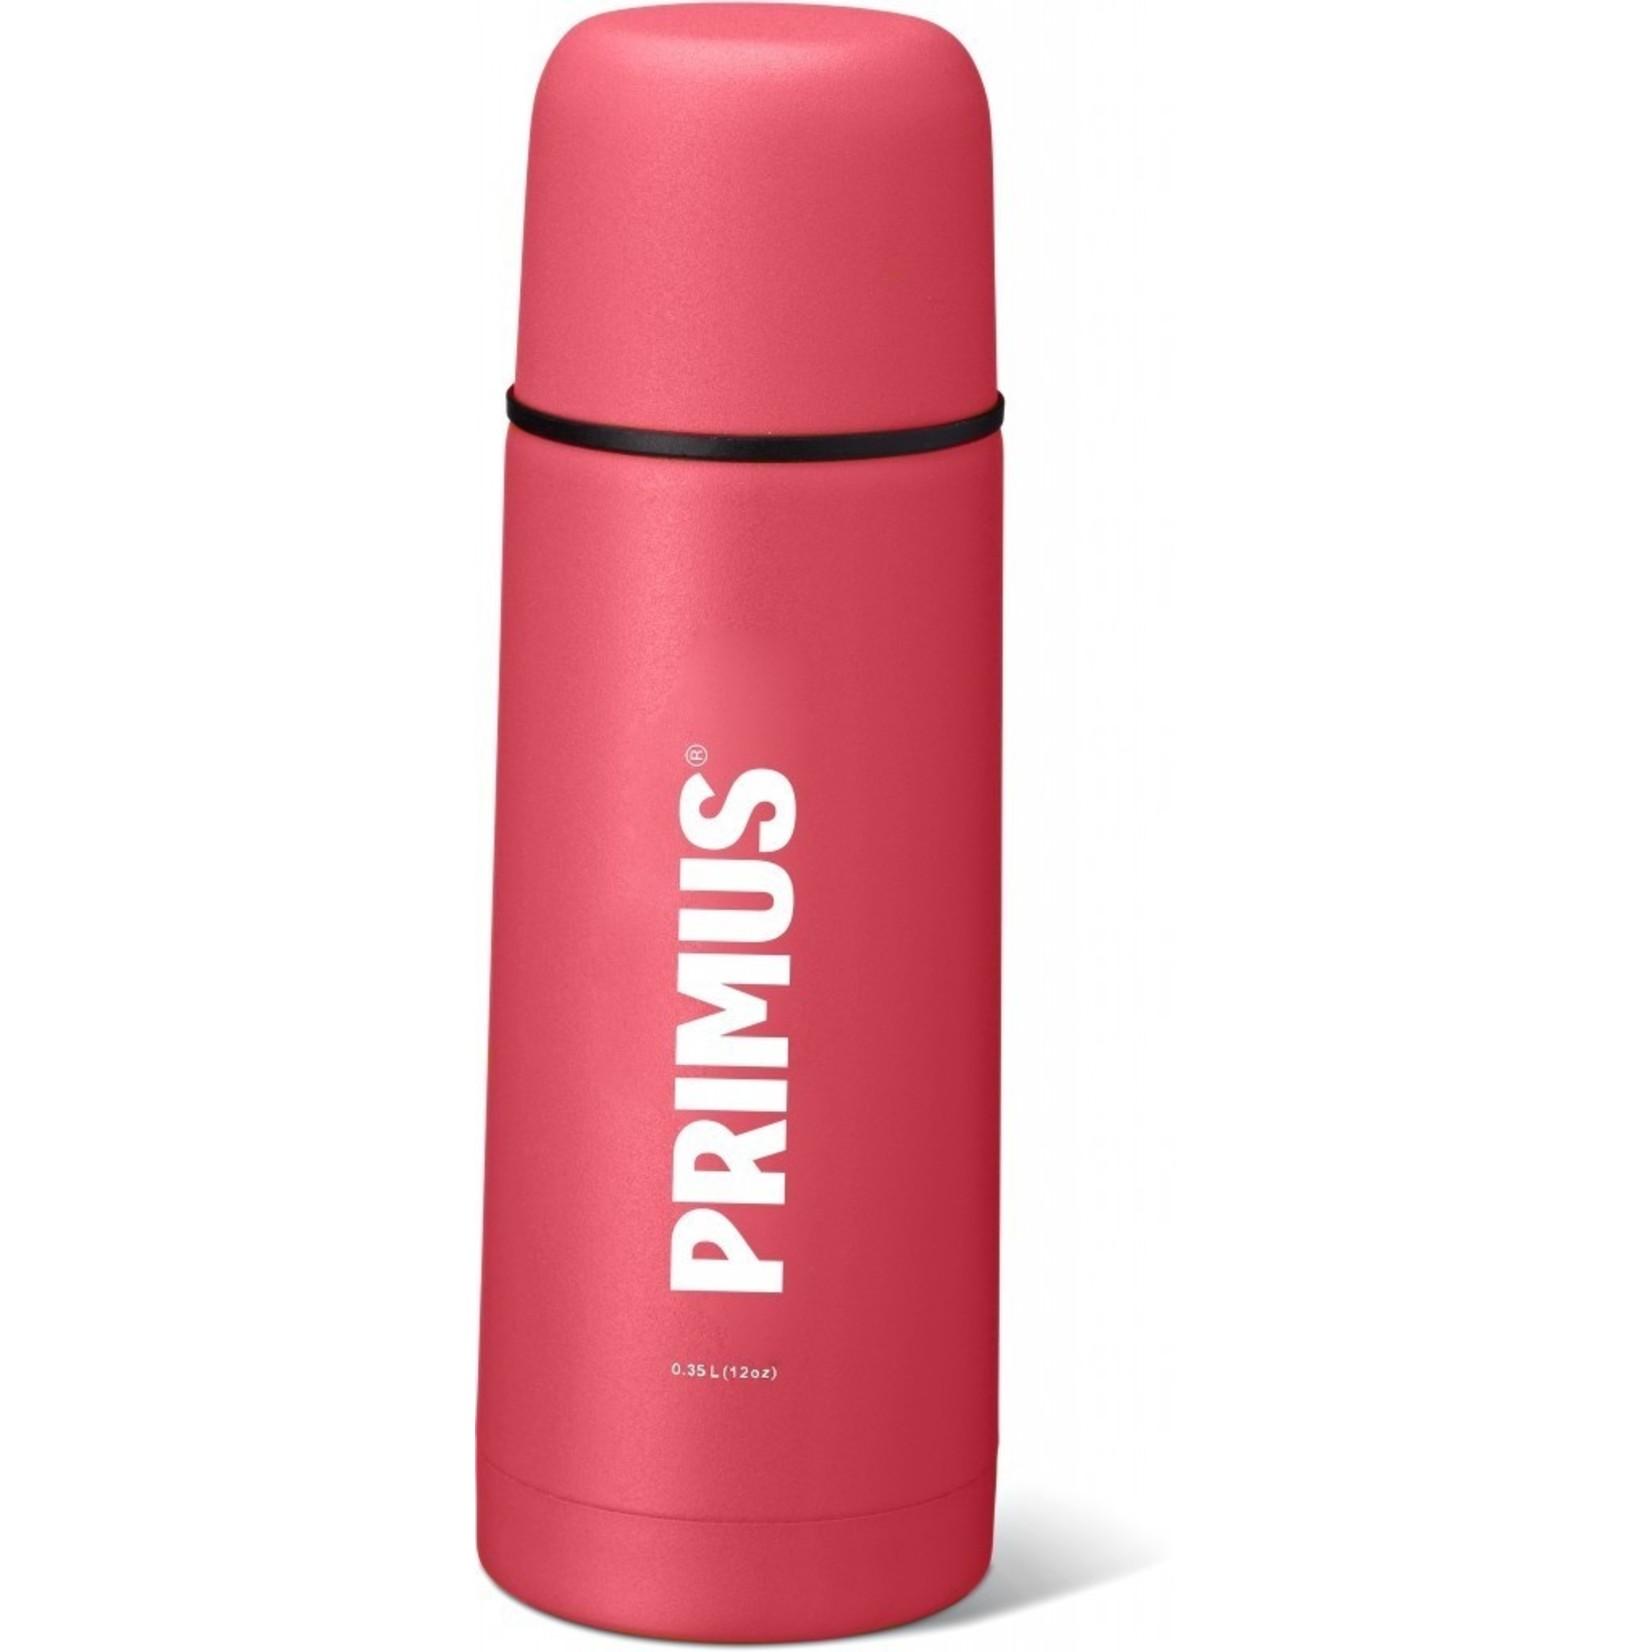 Primus Primus thermosfles 0,75 liter meloen roze